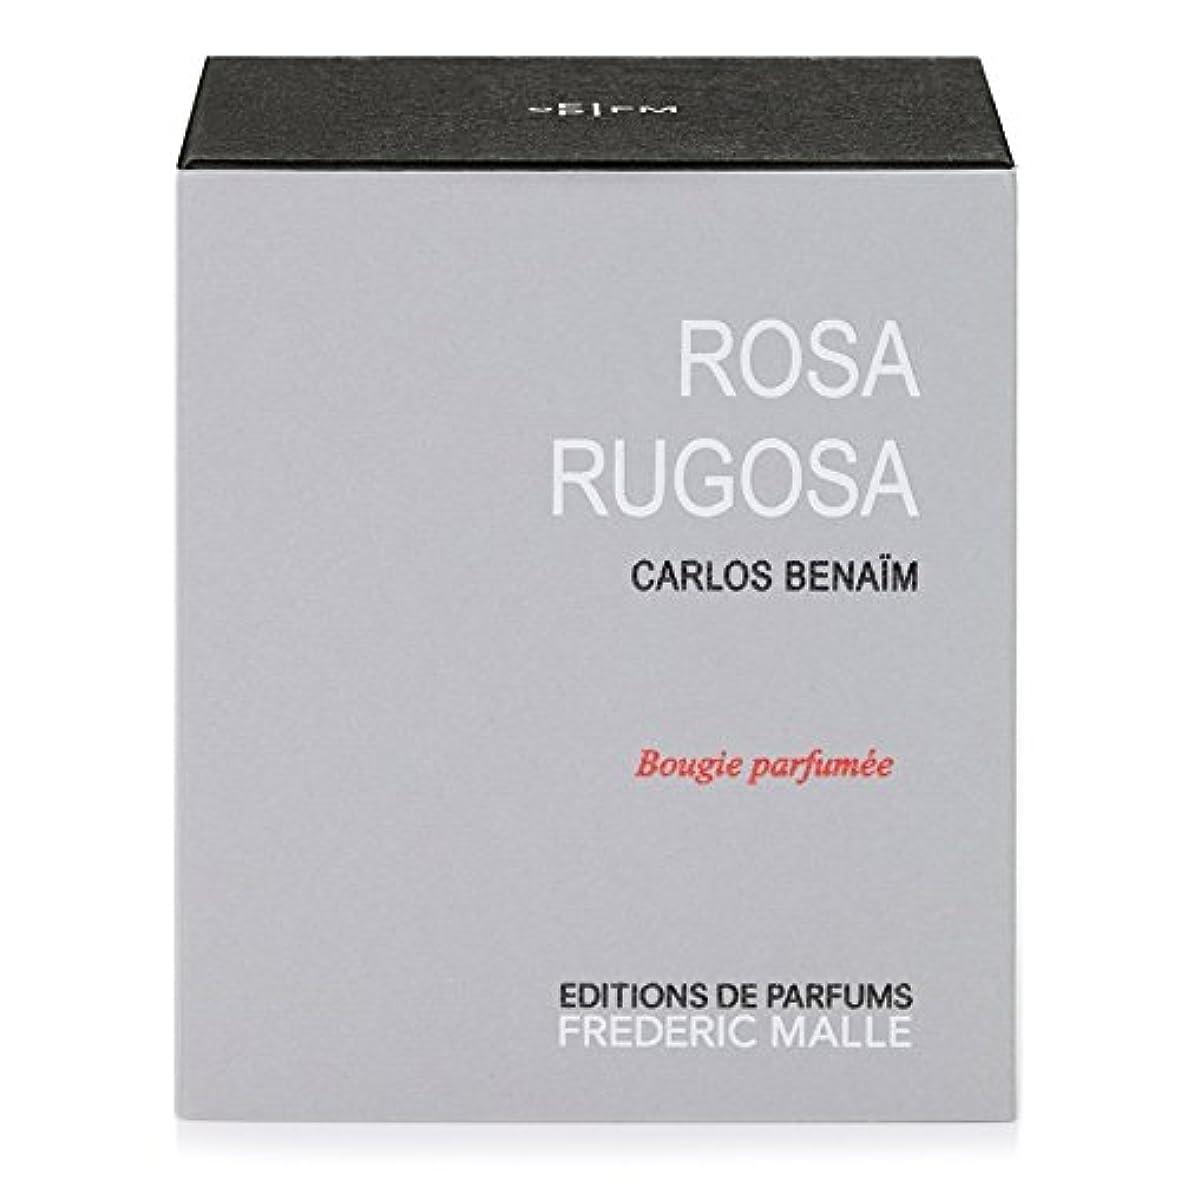 Frederic Malle Rosa Rugosa Scented Candle (Pack of 4) - フレデリック?マルハマナスの香りのキャンドル x4 [並行輸入品]